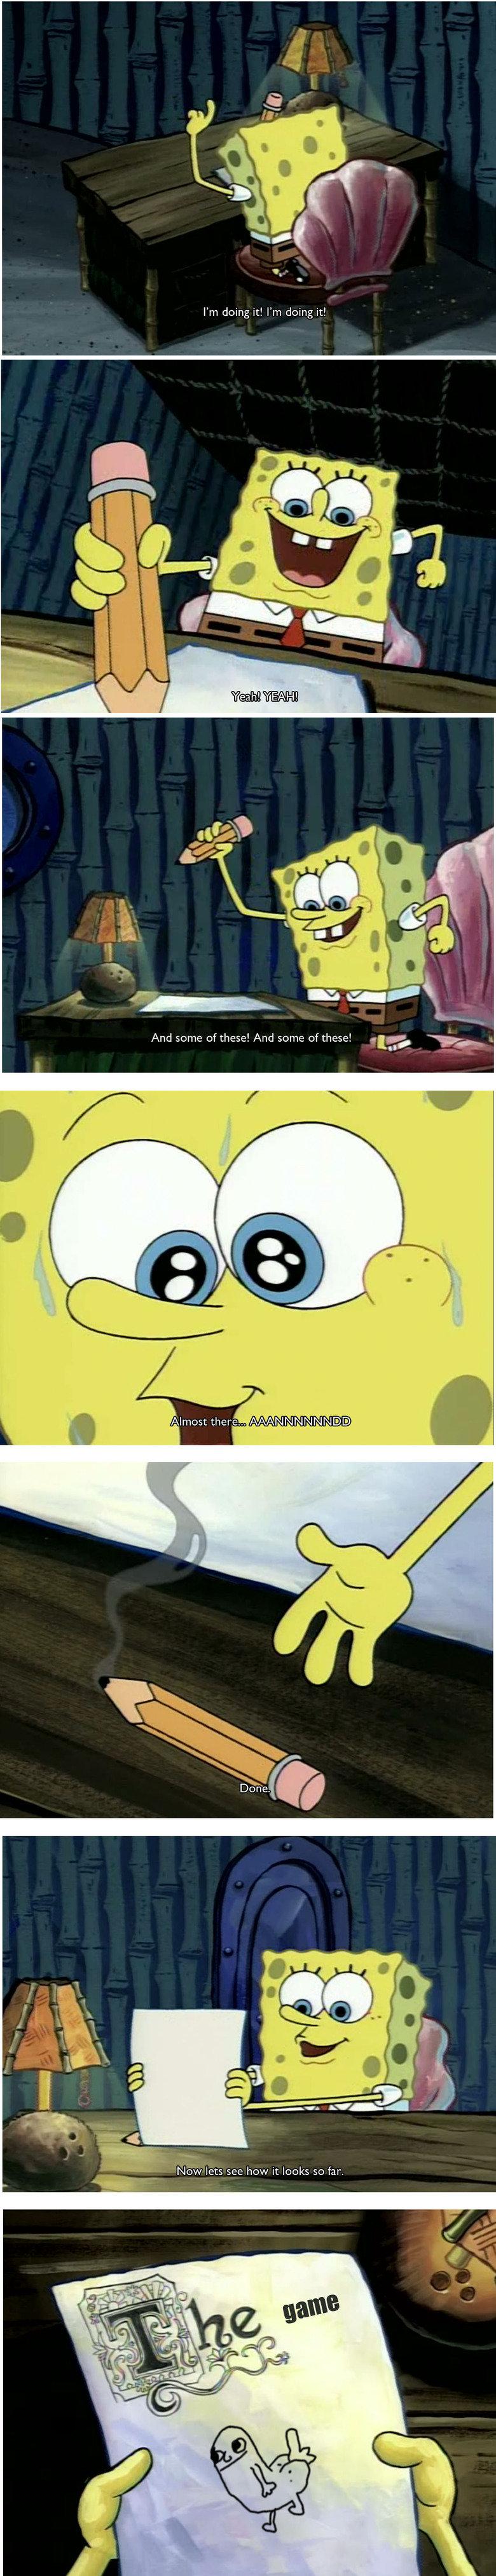 Spongebob post? Yes.. I loved this episode as a kid. NOSTALGIA BONER..